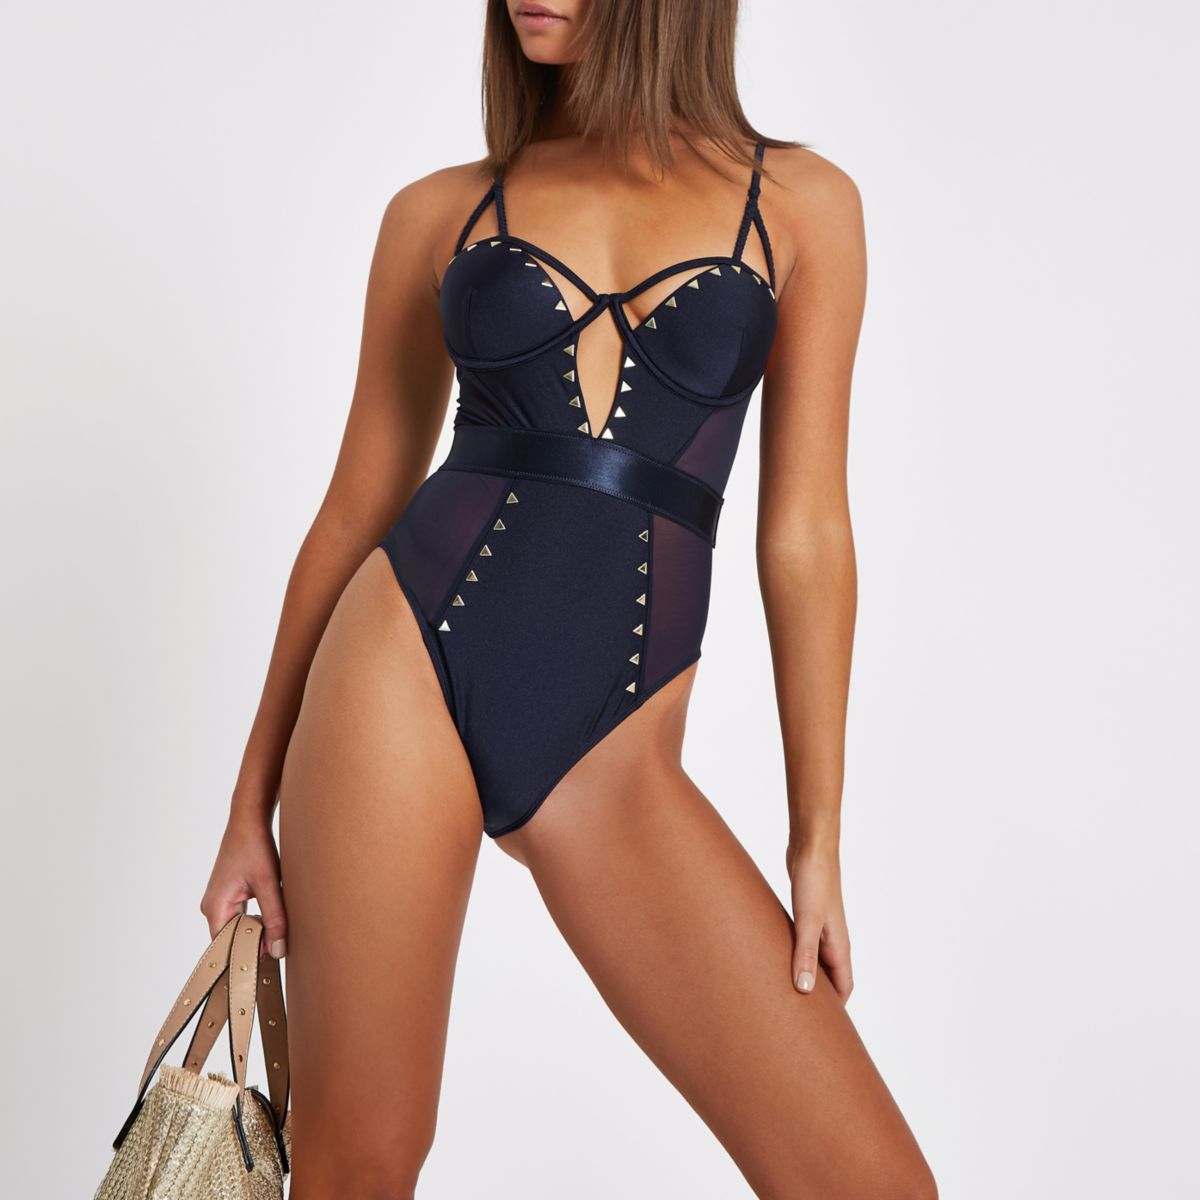 Navy balconette heatseal studded swimsuit